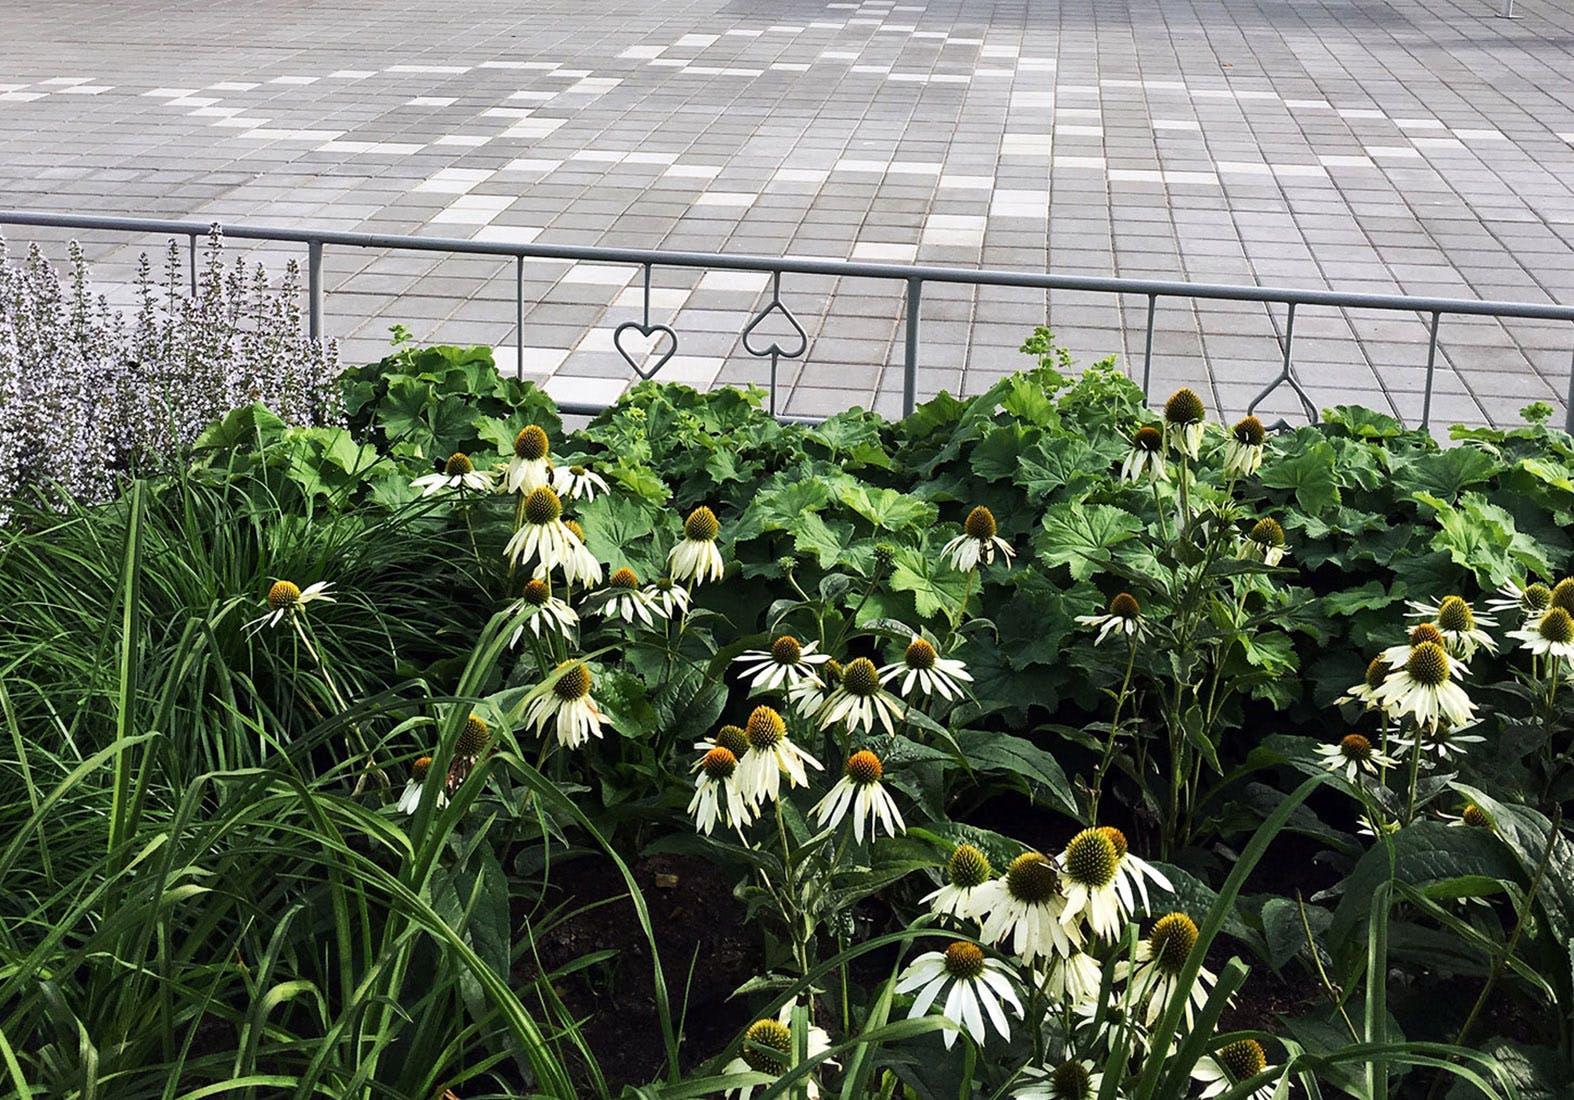 Flowering plants and seasonal interest